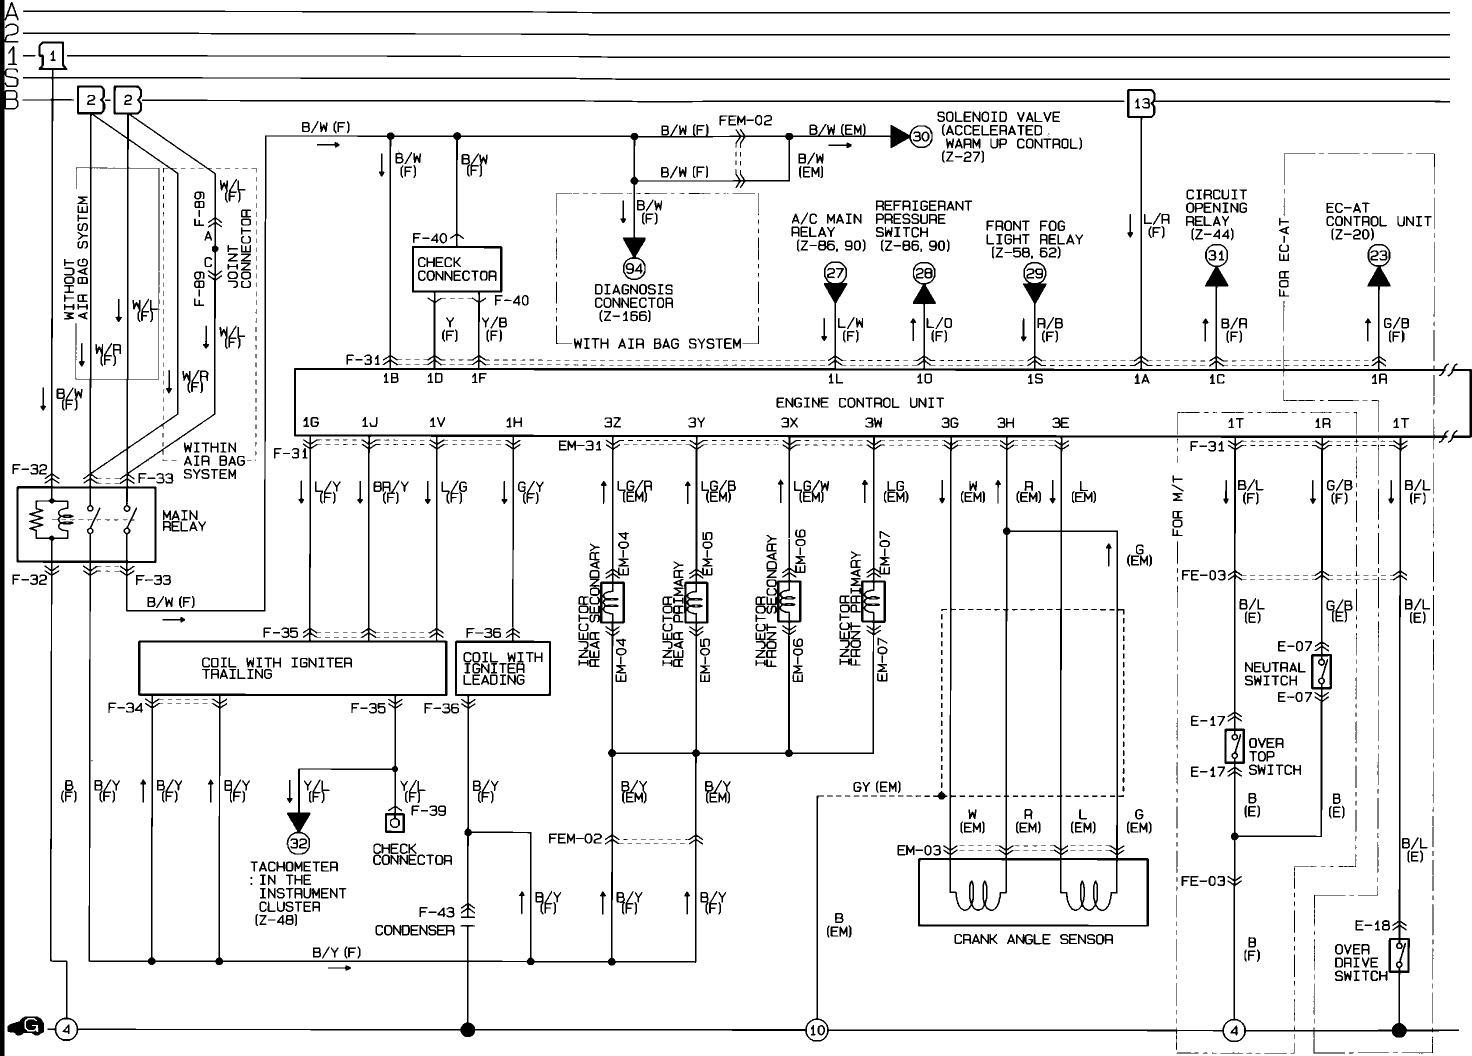 1992 mazda b2200 wiring diagram 2002 nissan sentra stereo rx 7 vacuum html - imageresizertool.com